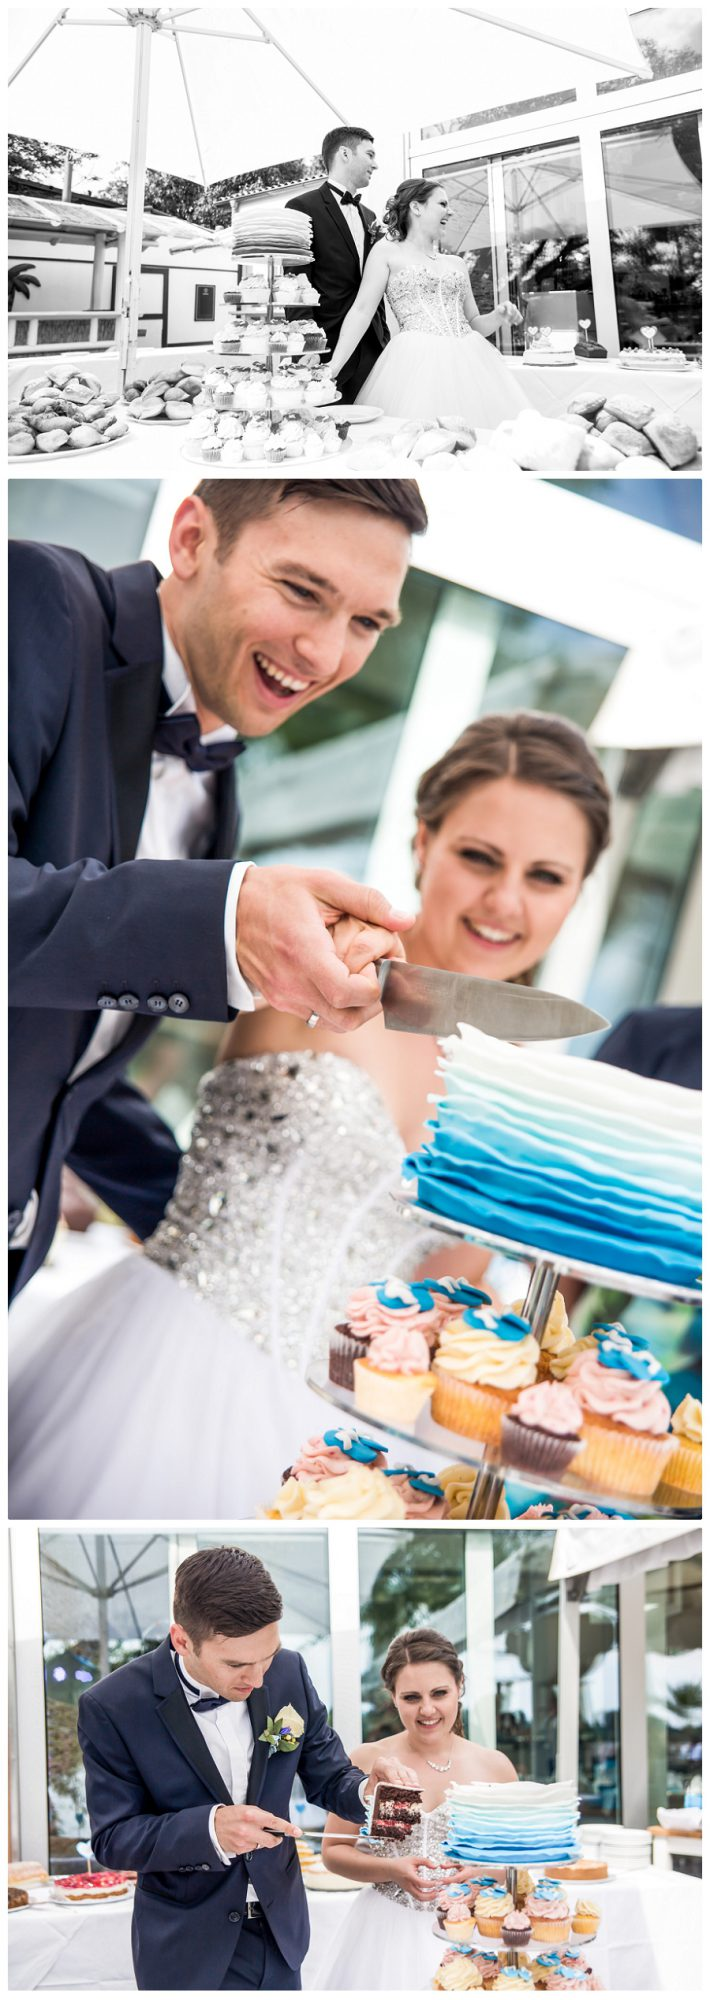 Hochzeit_Strandhaus_Nürnberg_ClaudiaPelny_0040